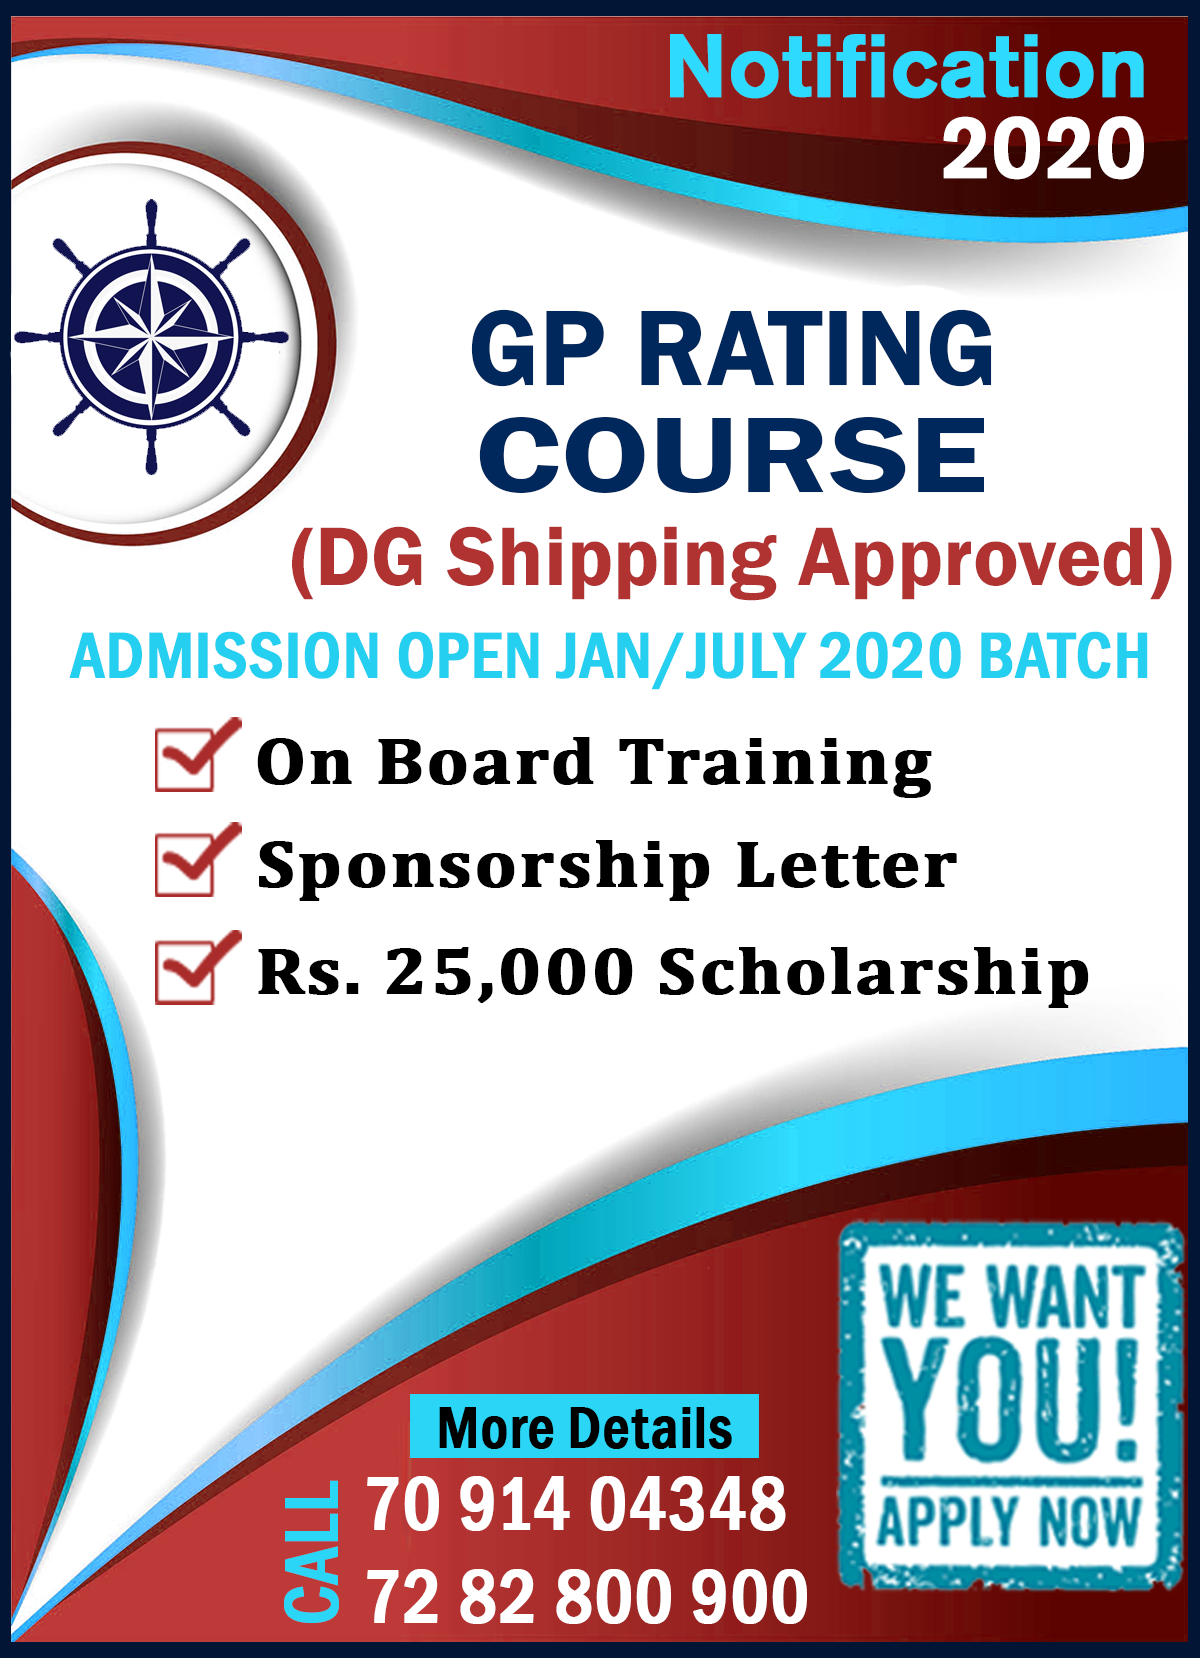 Sri_Chakra_Maritime_College_Merchant_Navy_Admission_notifications_2019